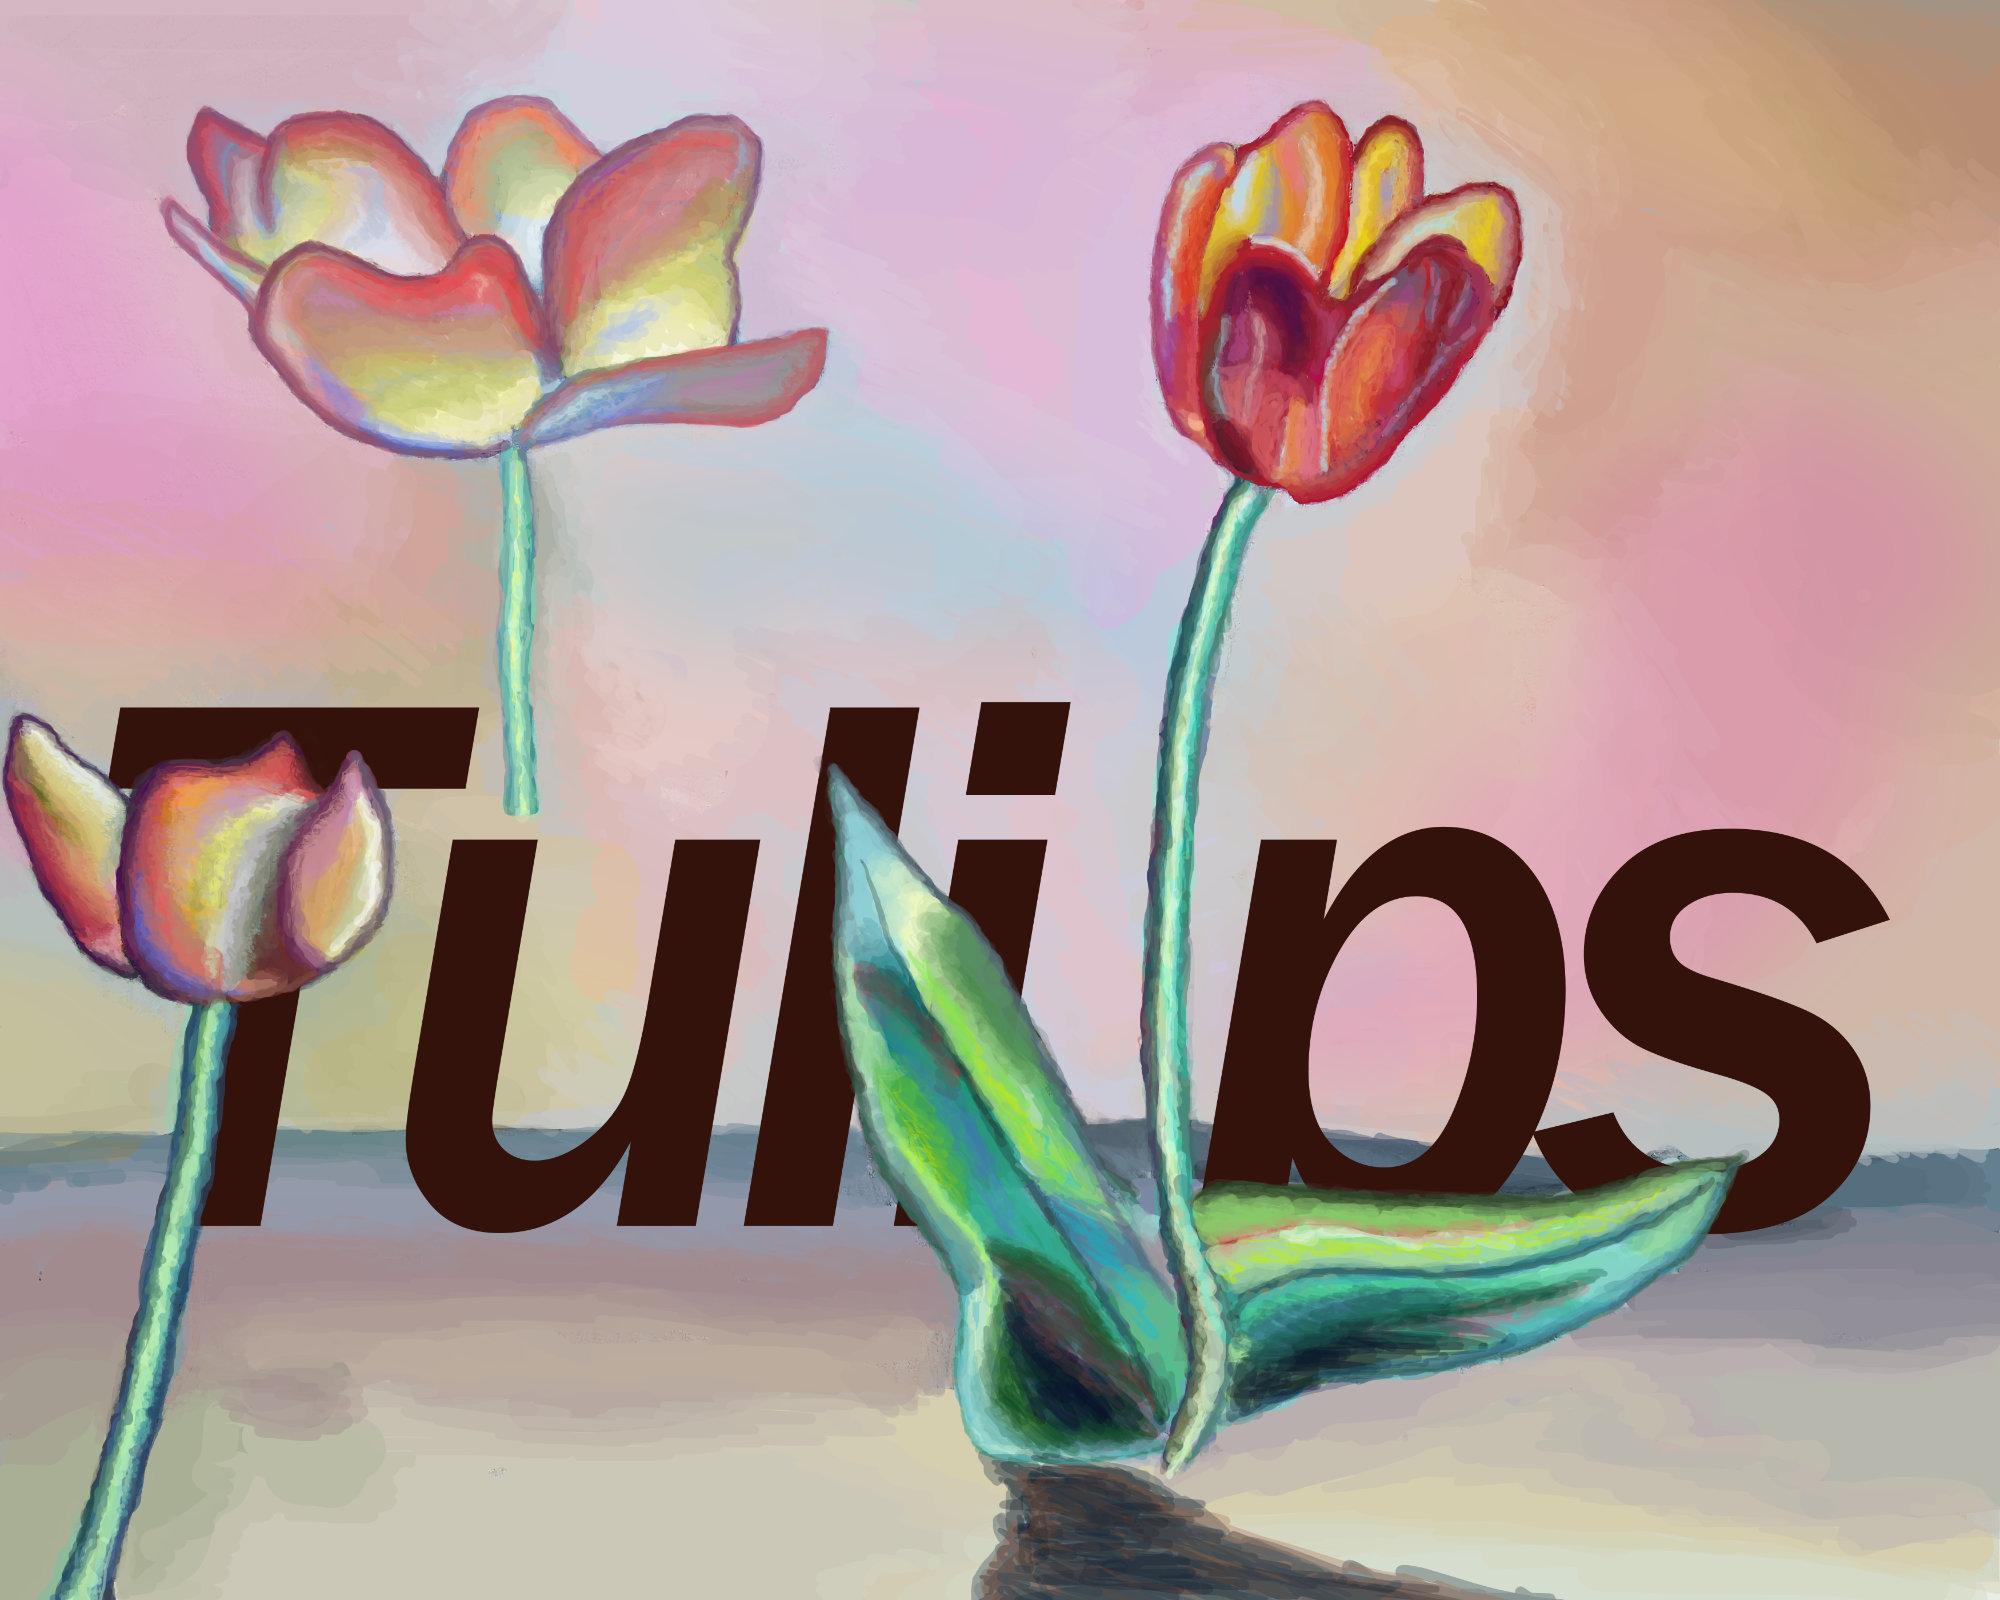 Tulipsv8_Text_proof_ul